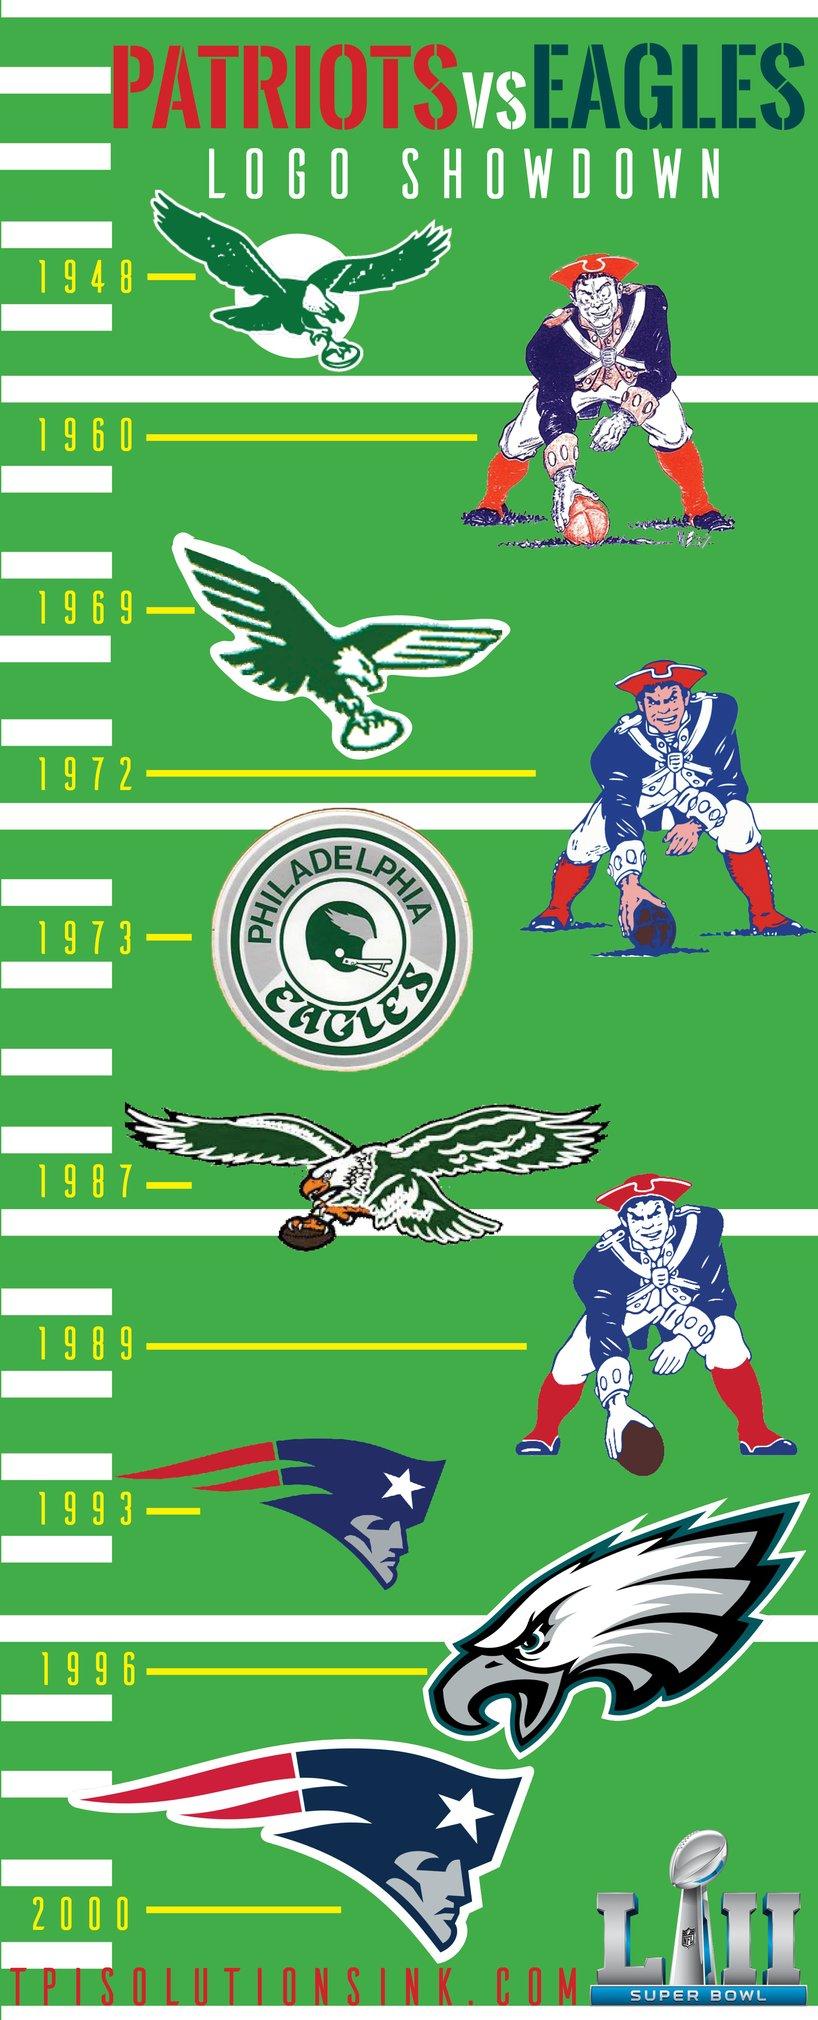 Super Bowl LII Logo Showdown: Patriots vs. Eagles 2018